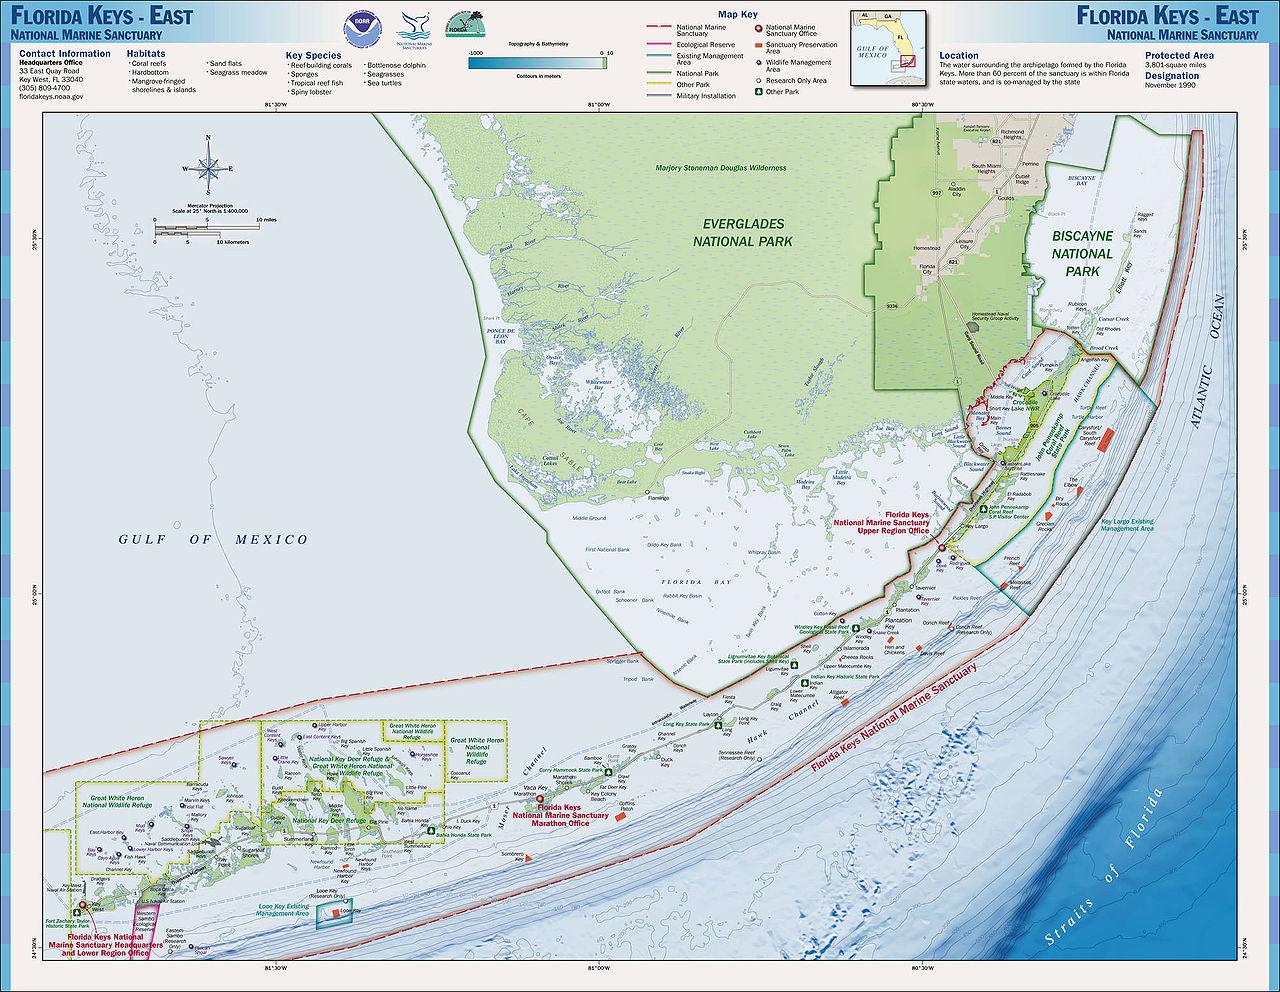 Charts And Maps Florida Keys - Florida Go Fishing - Florida Keys Topographic Map